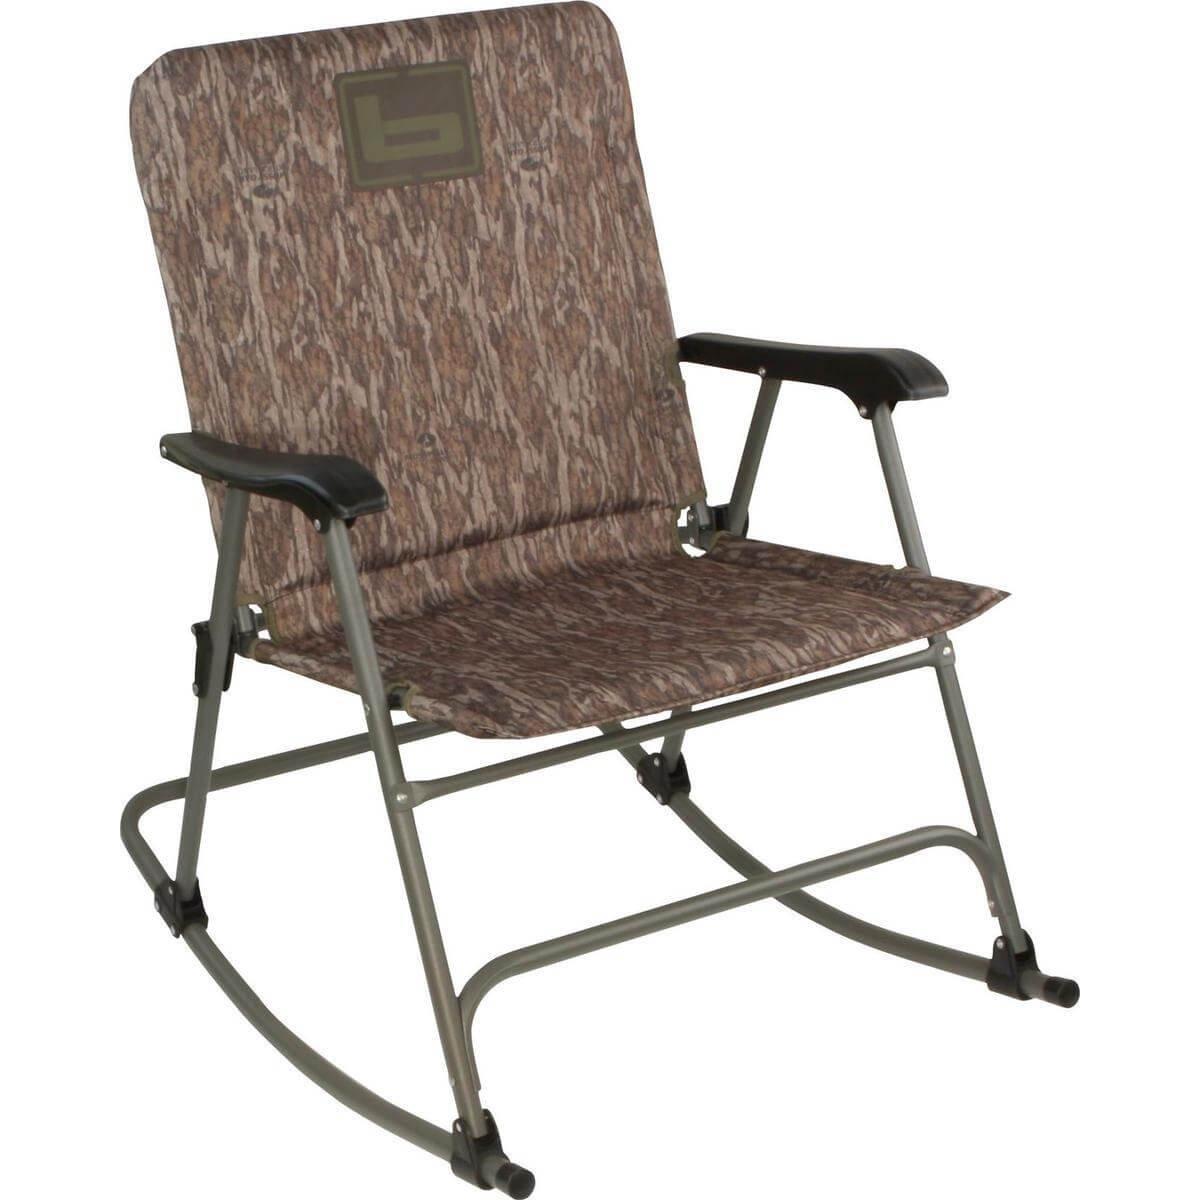 Banded B08712 Rocking Chair Bottomland Hunting Gear